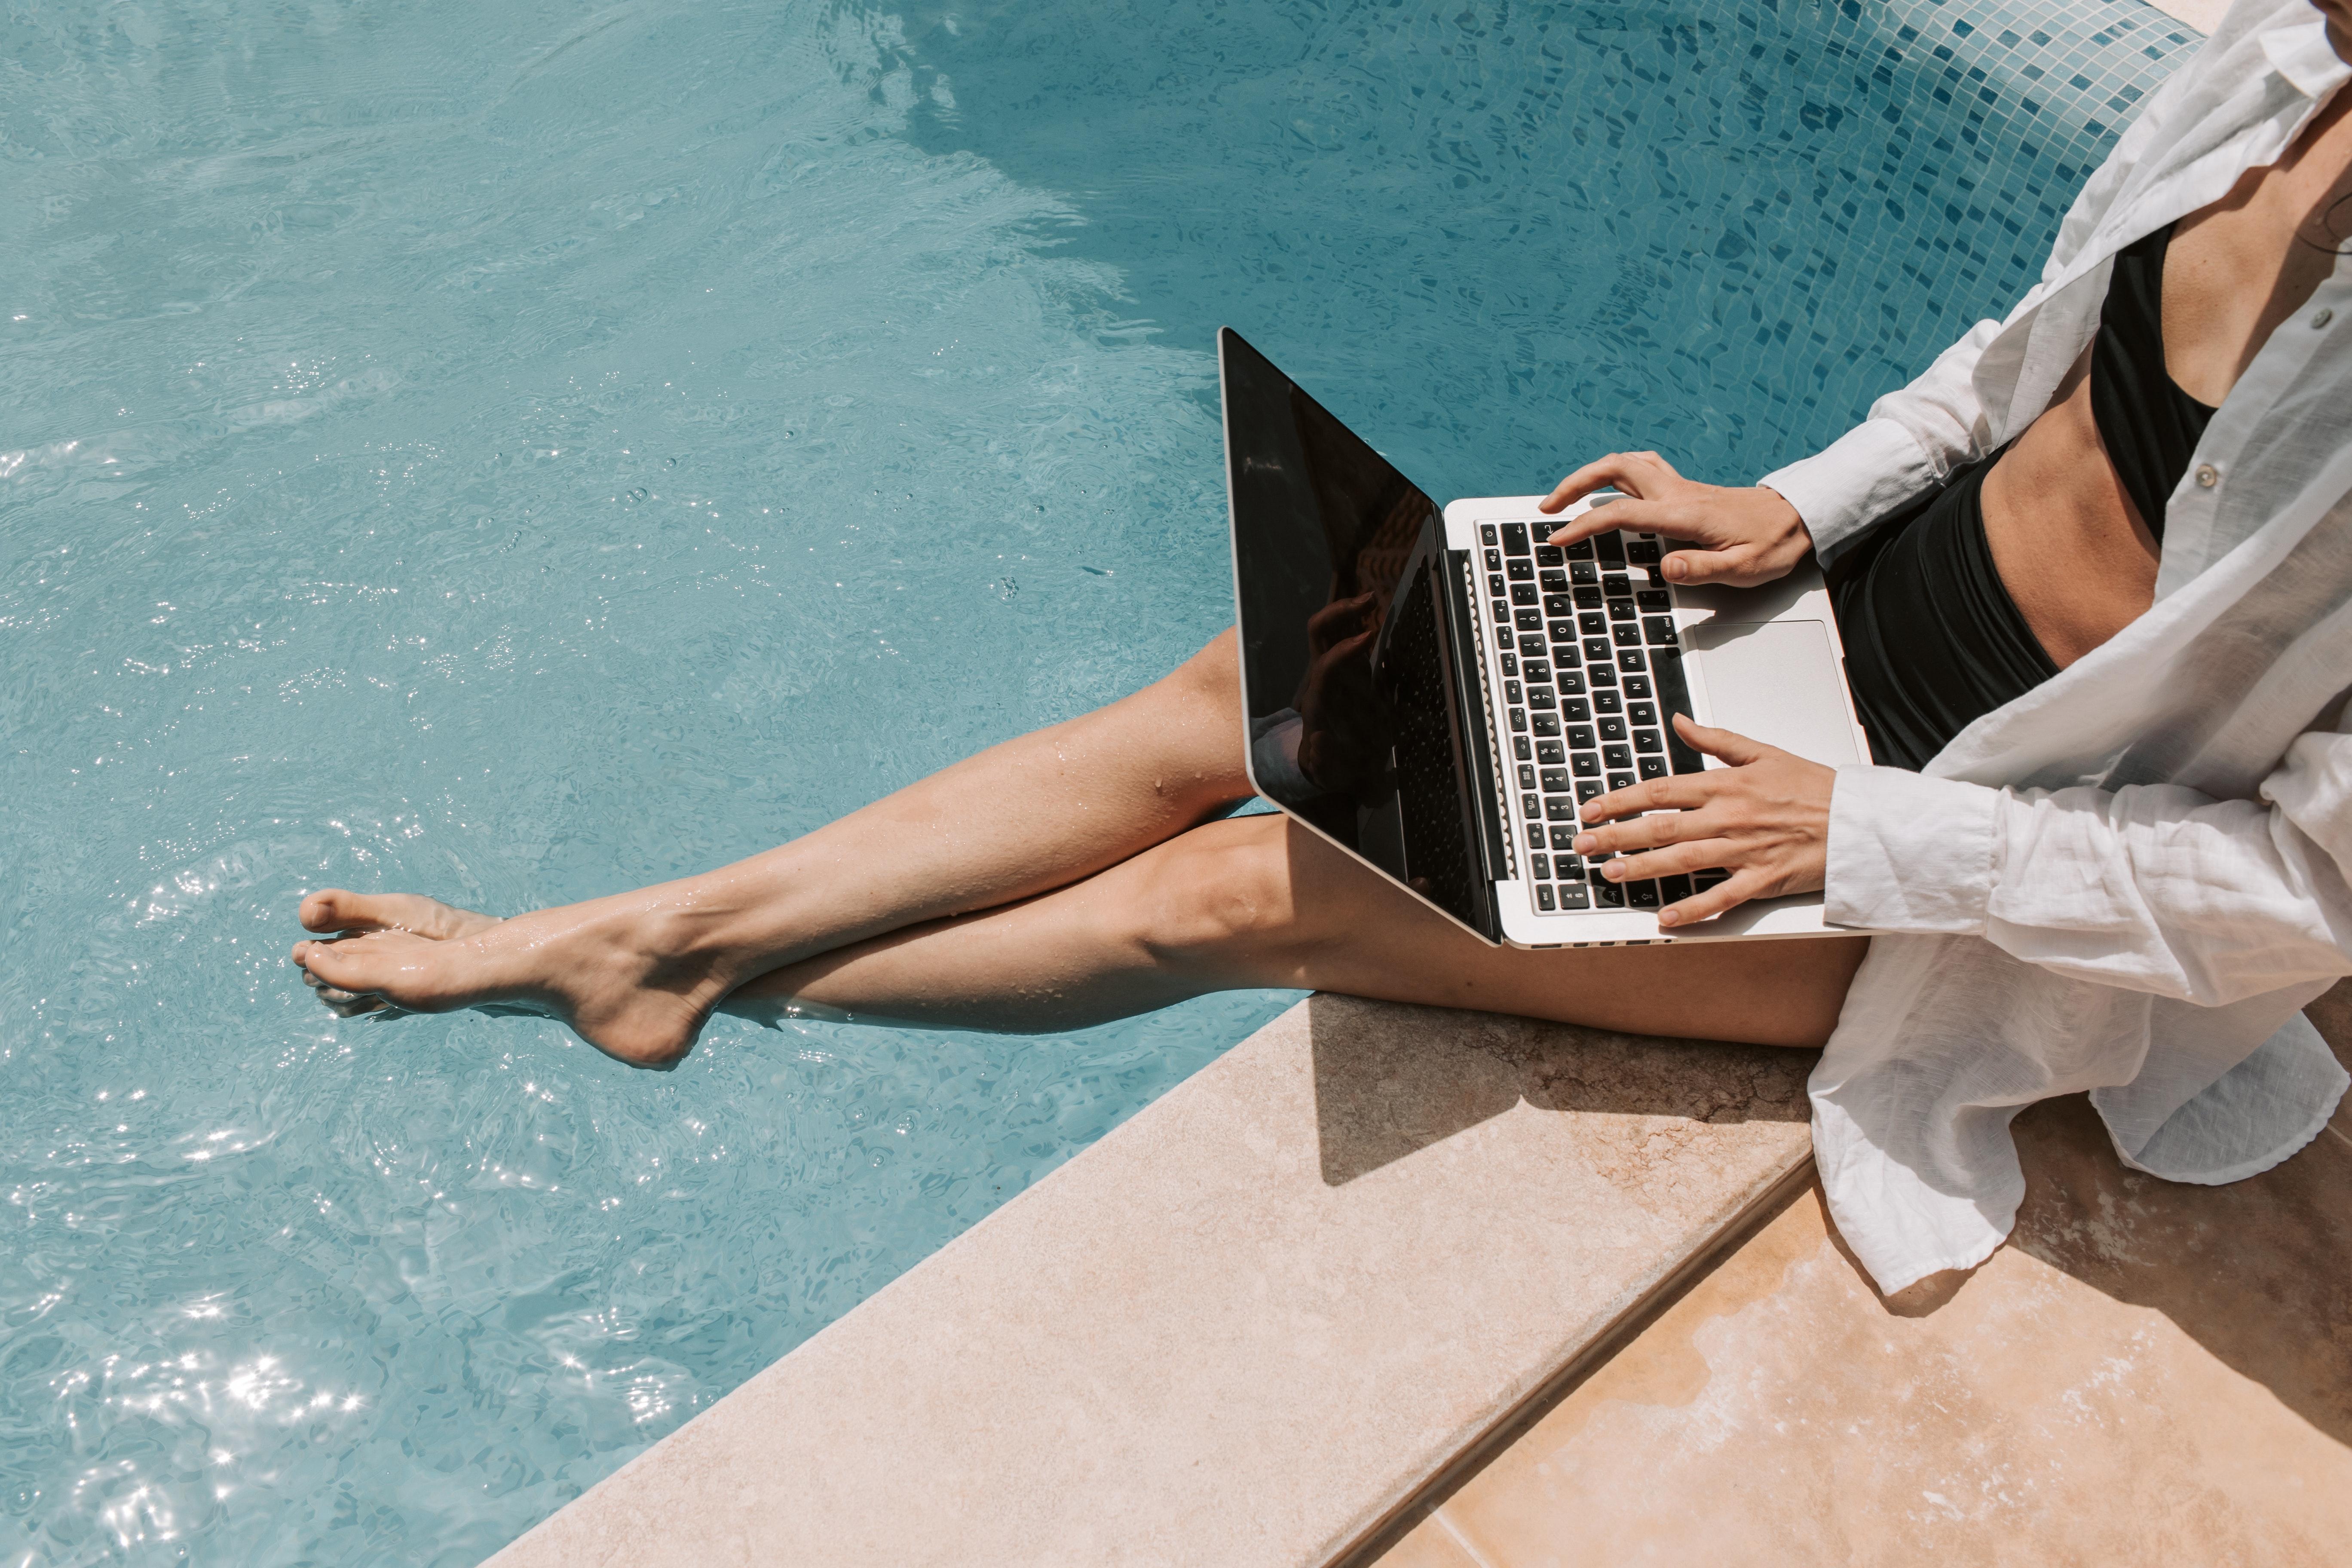 Women sitting poolside working on her laptop